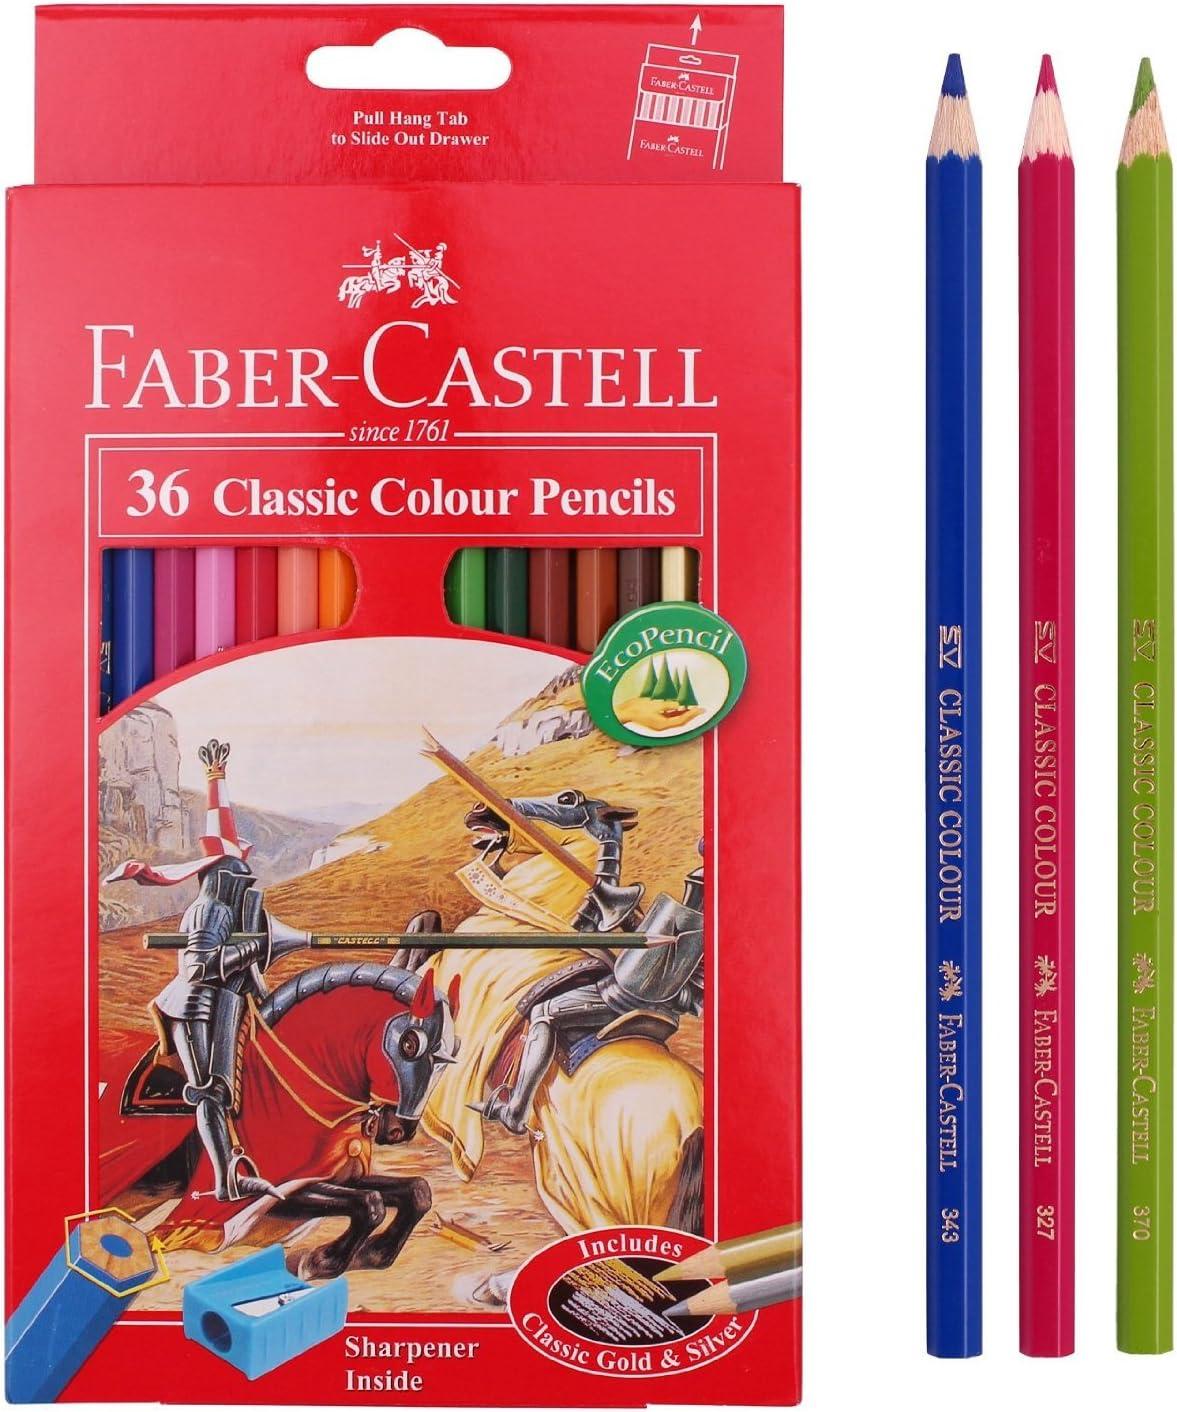 faber castell classic color pencils 36